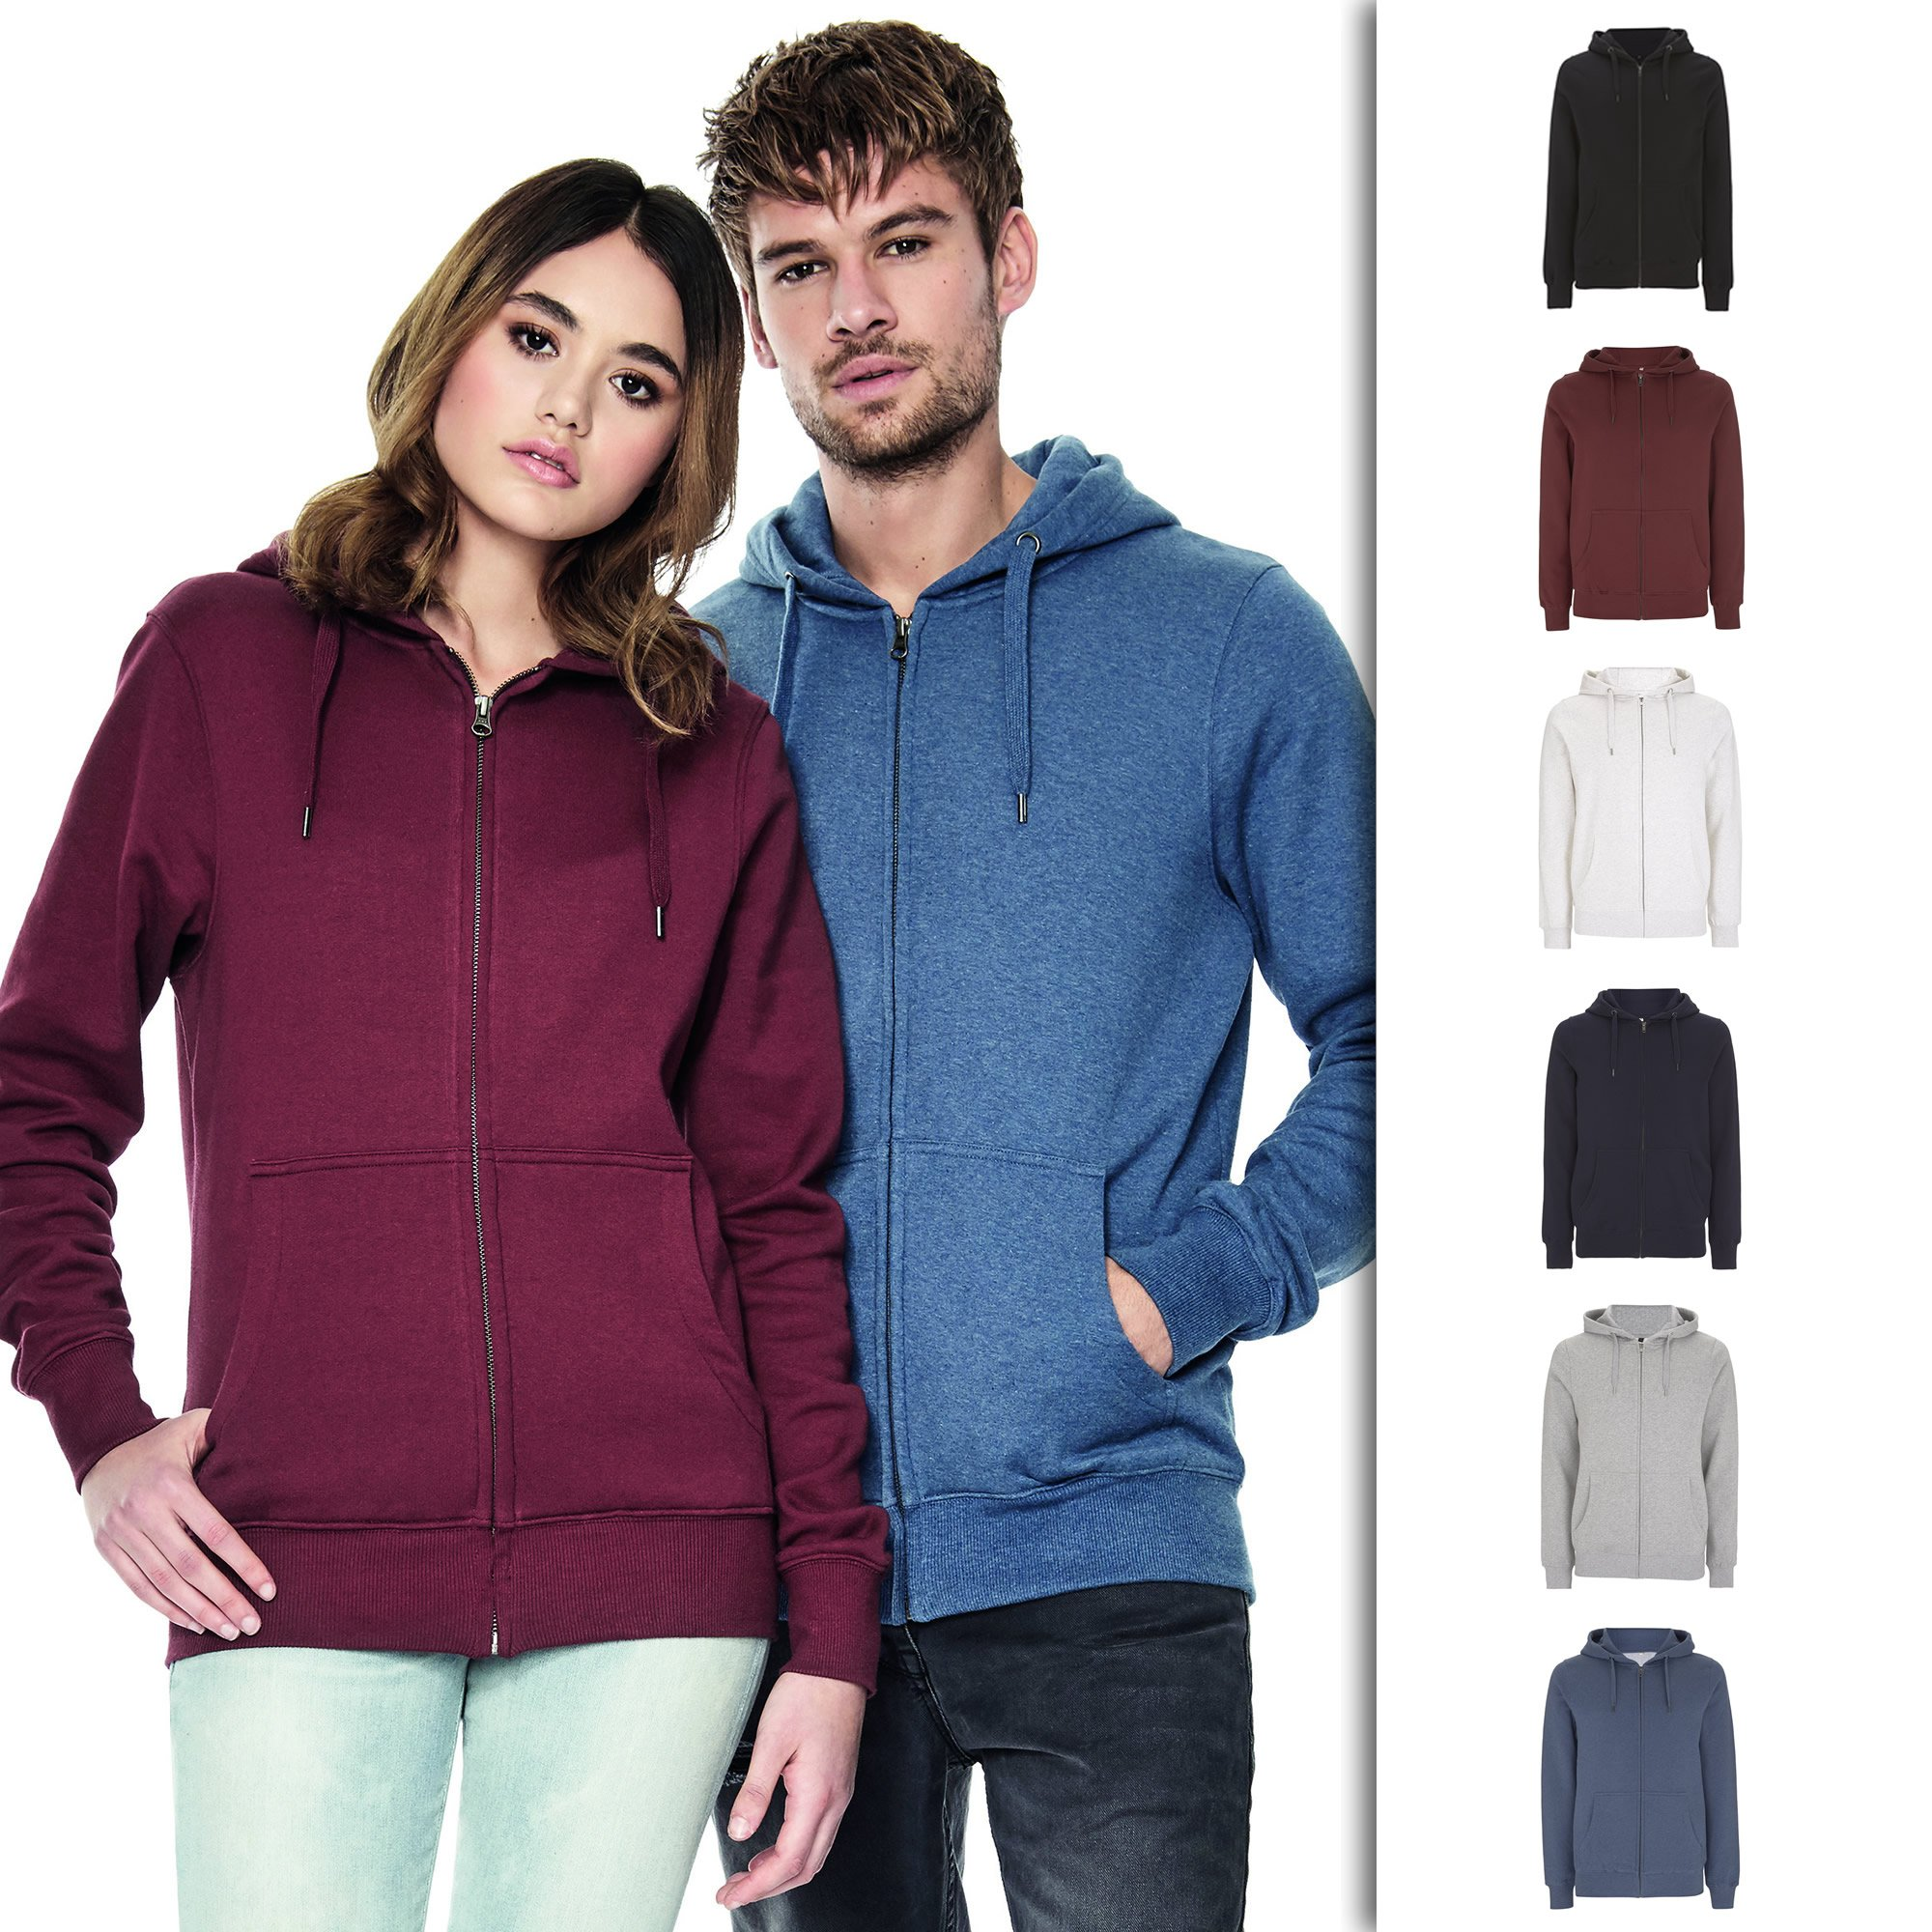 Underhood of London Navy Zip Up Hoodie For Women | Lightweight Organic Cotton Womens Jacket | Medium